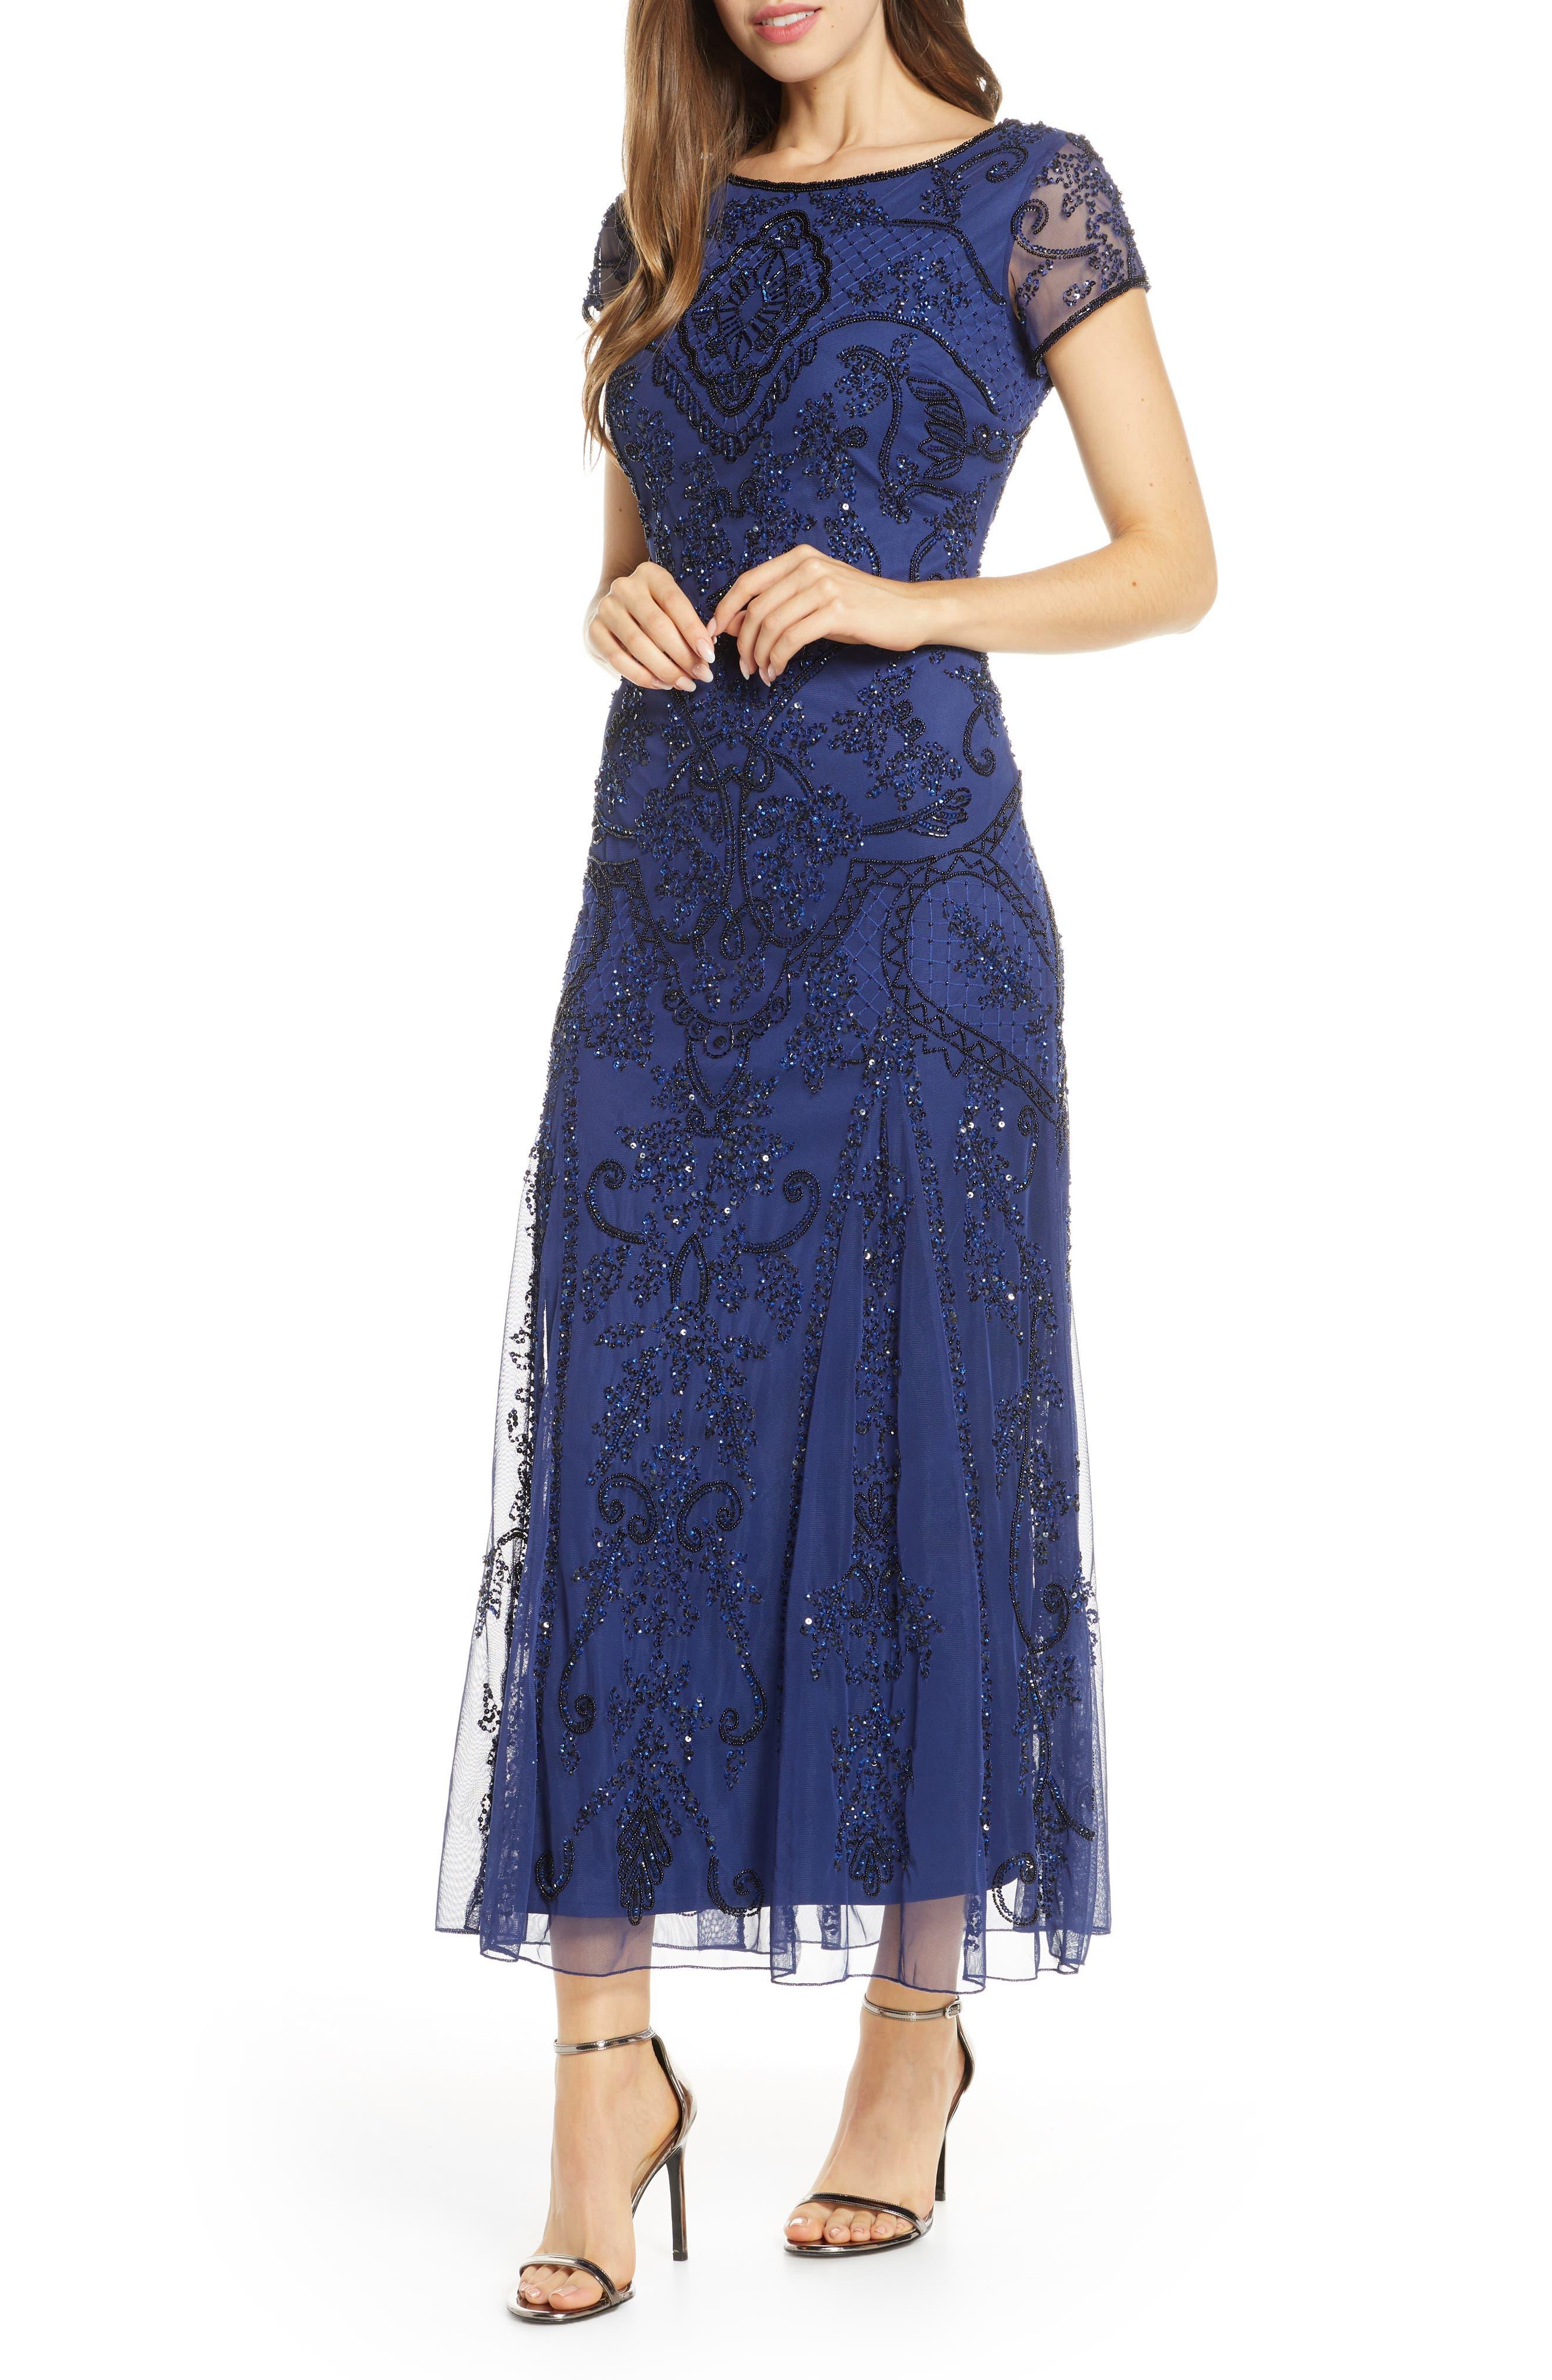 1930s Evening Dresses | Old Hollywood Silver Screen Dresses Womens Pisarro Nights Embellished Mesh Gown Size 8 - Blue $238.00 AT vintagedancer.com